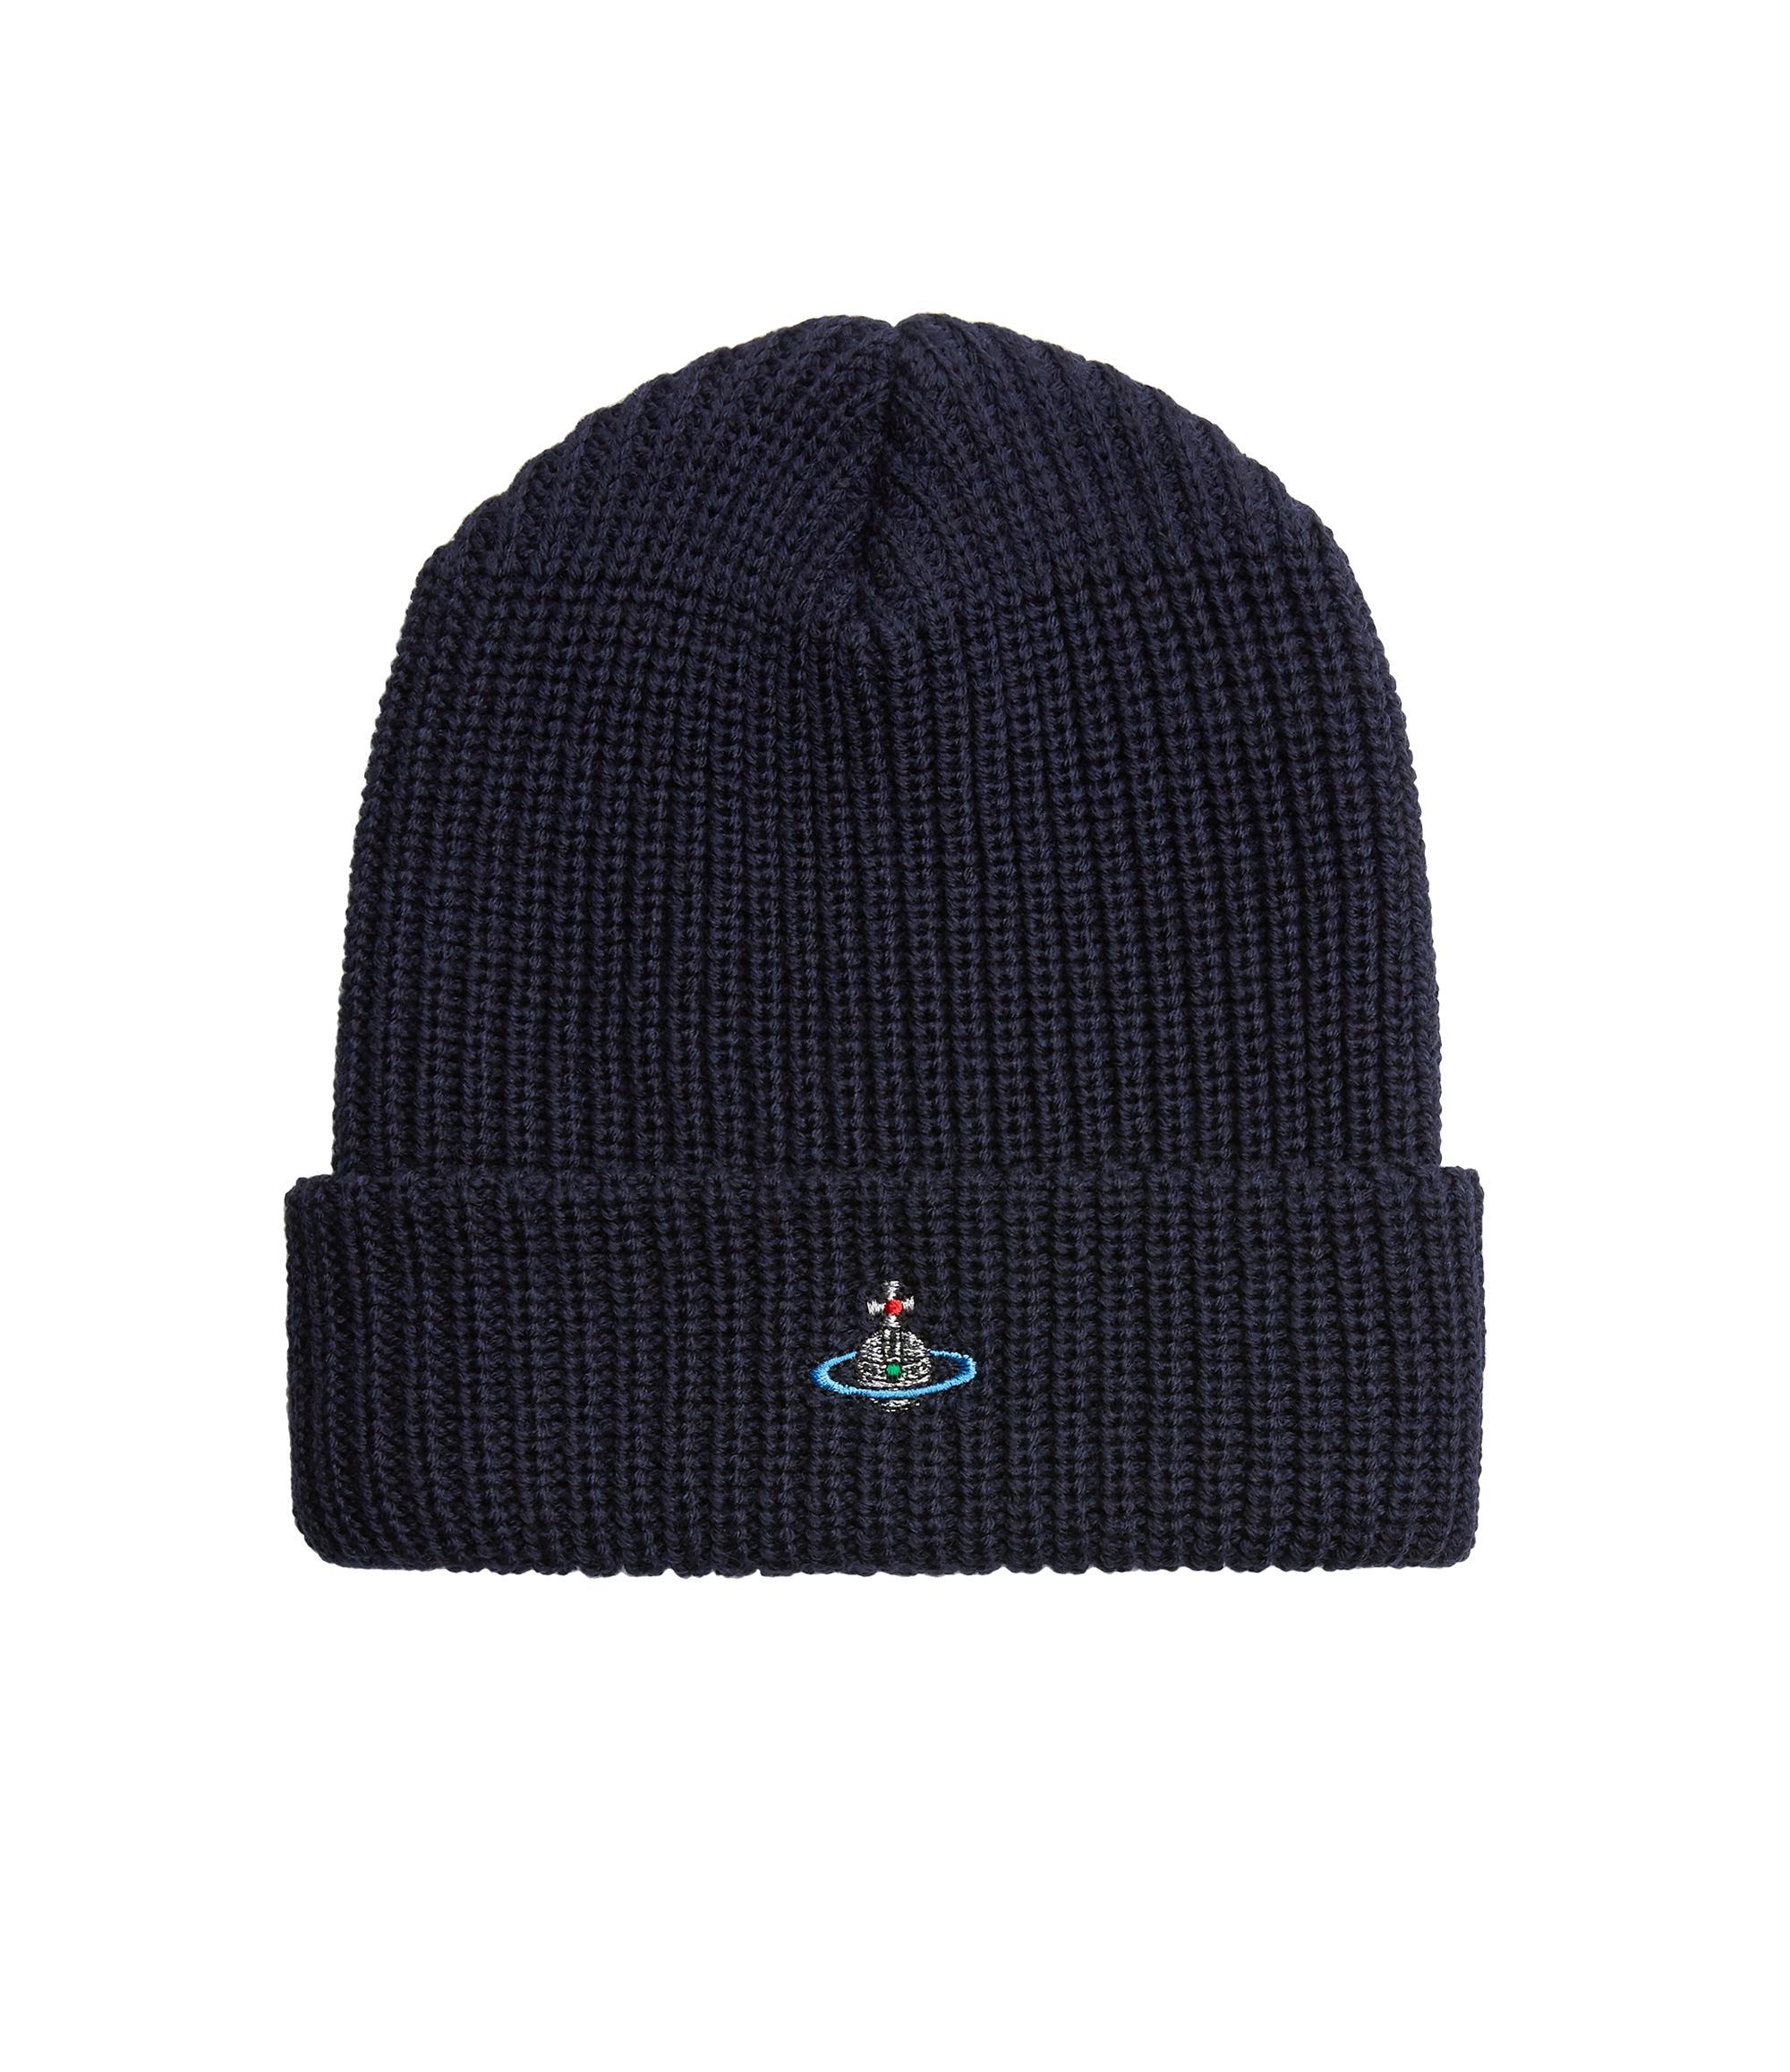 Vivienne Westwood Beanie Hat Navy in Blue for Men - Lyst 45d3a916ba4e